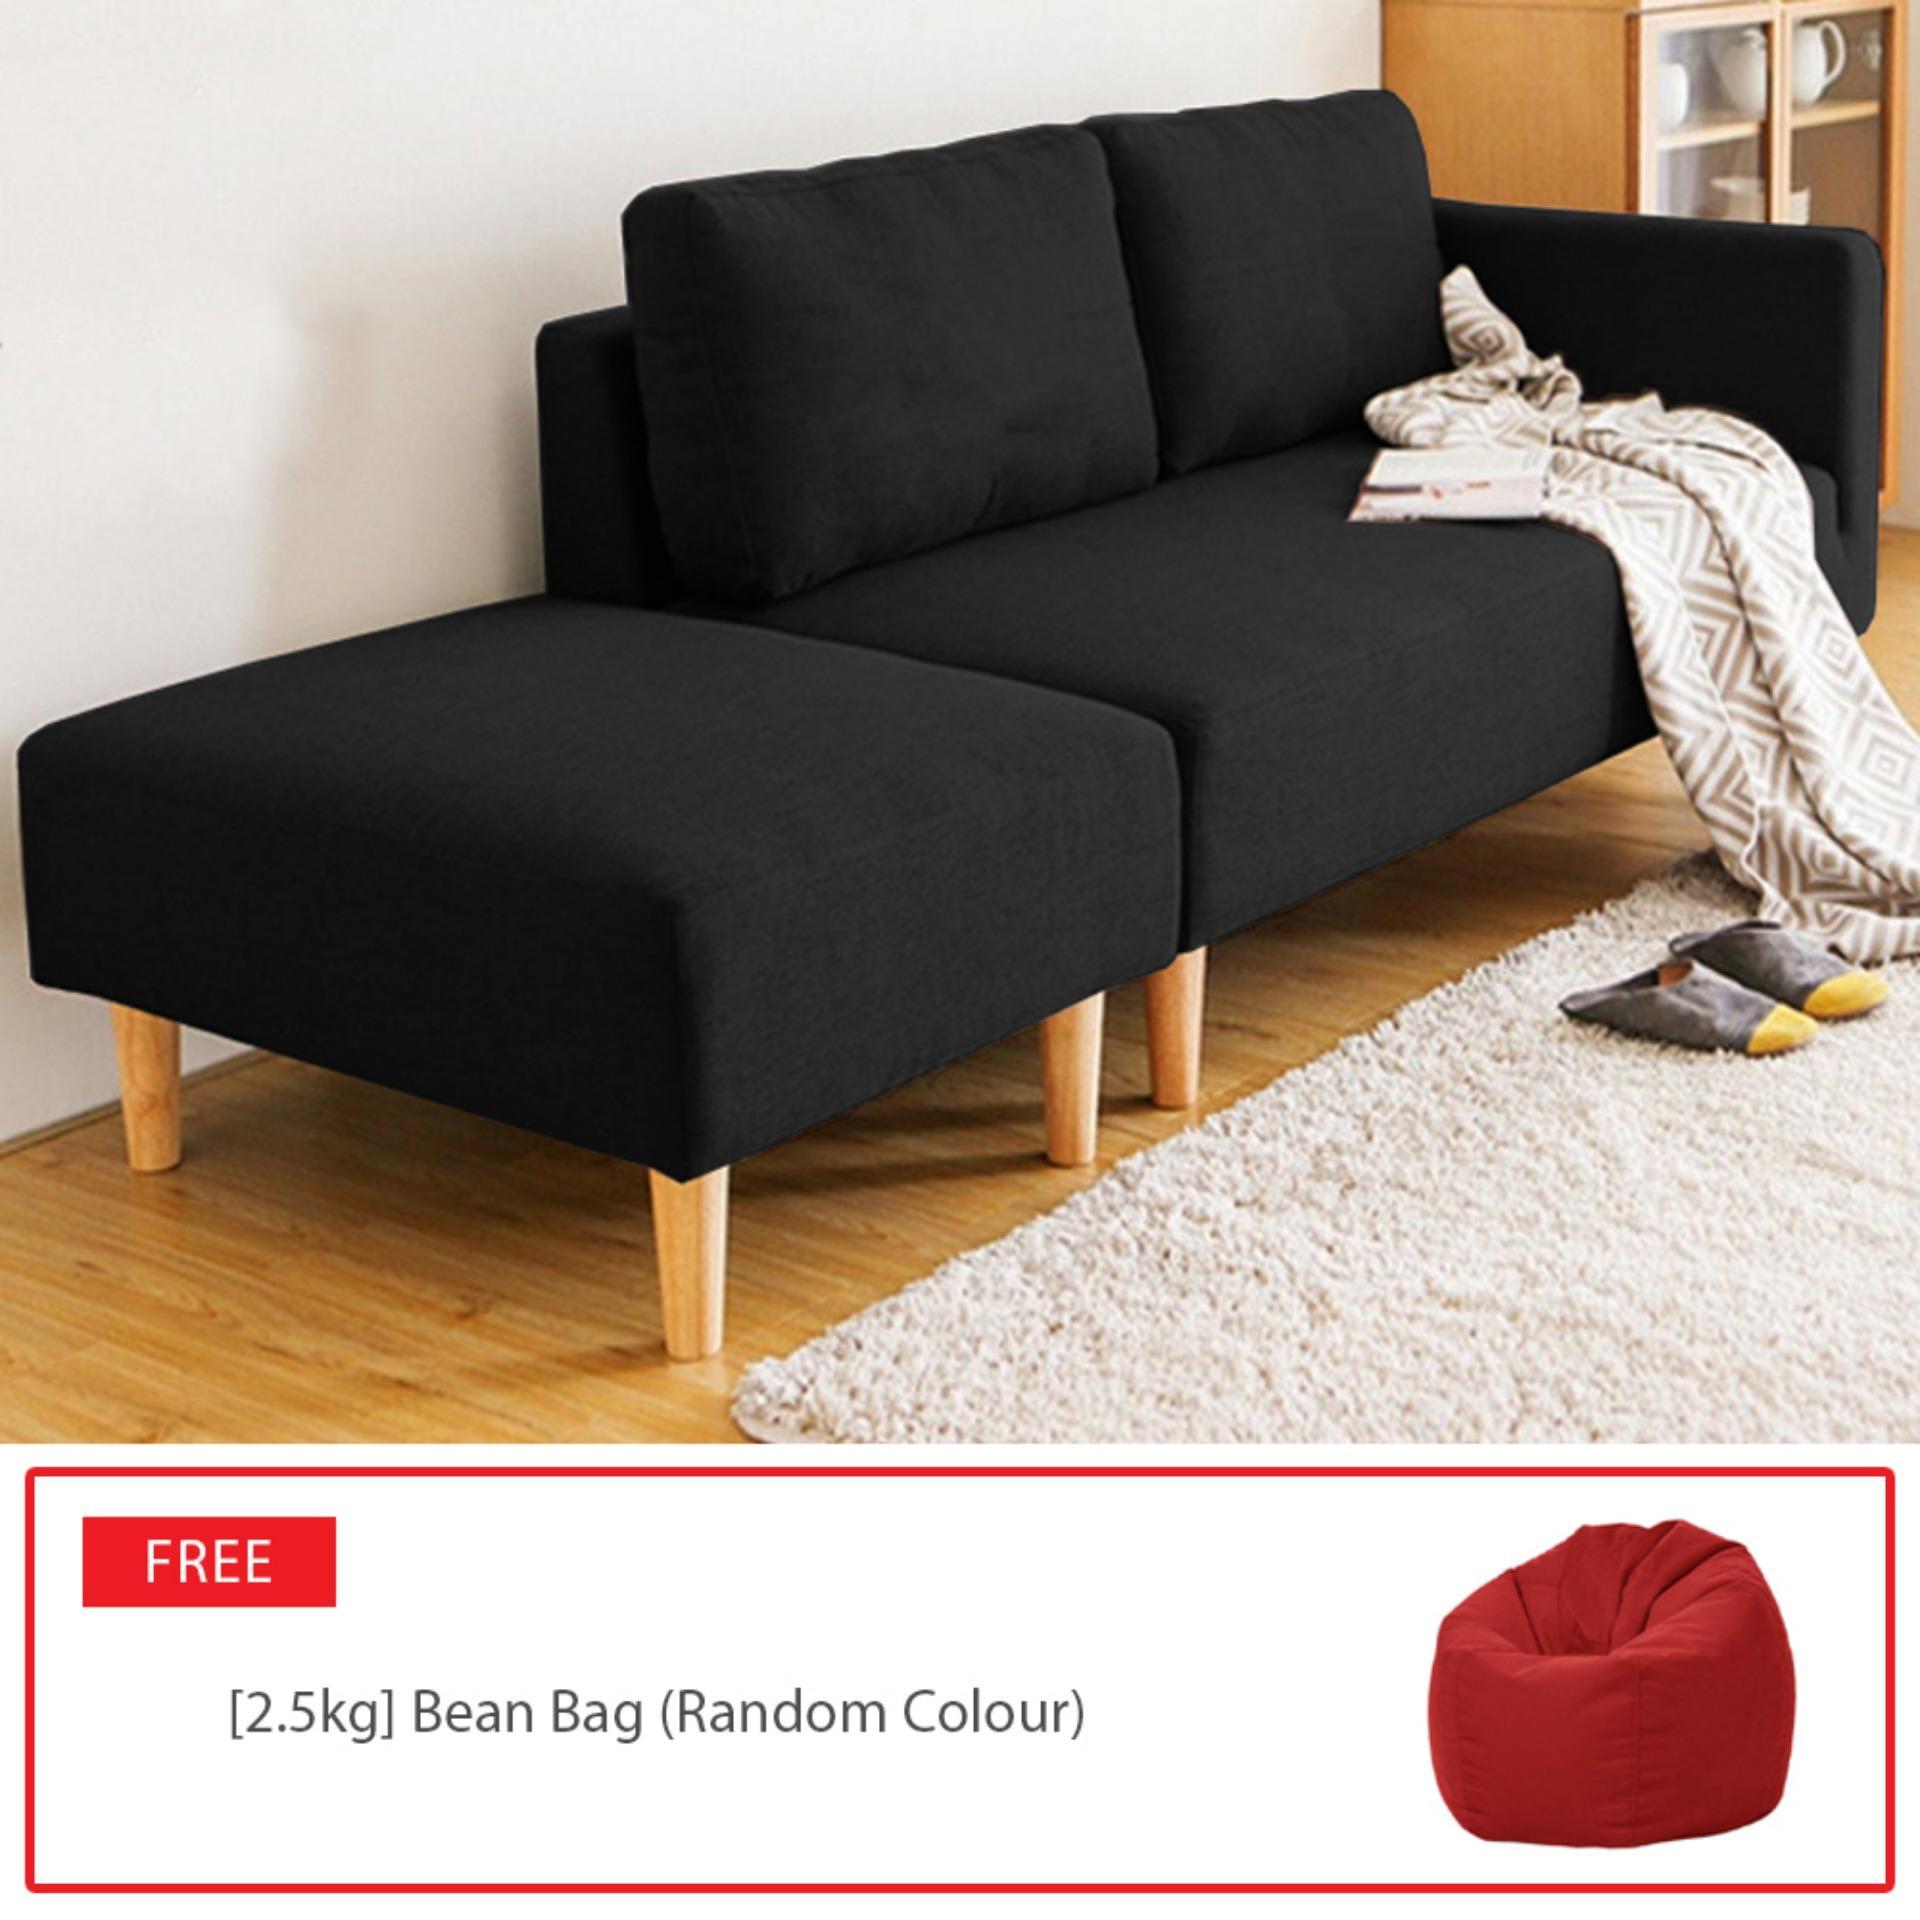 ELLISE 2 Seater Fabric L Shape Design Sofa with Stool [1 YEAR WARRANTY]